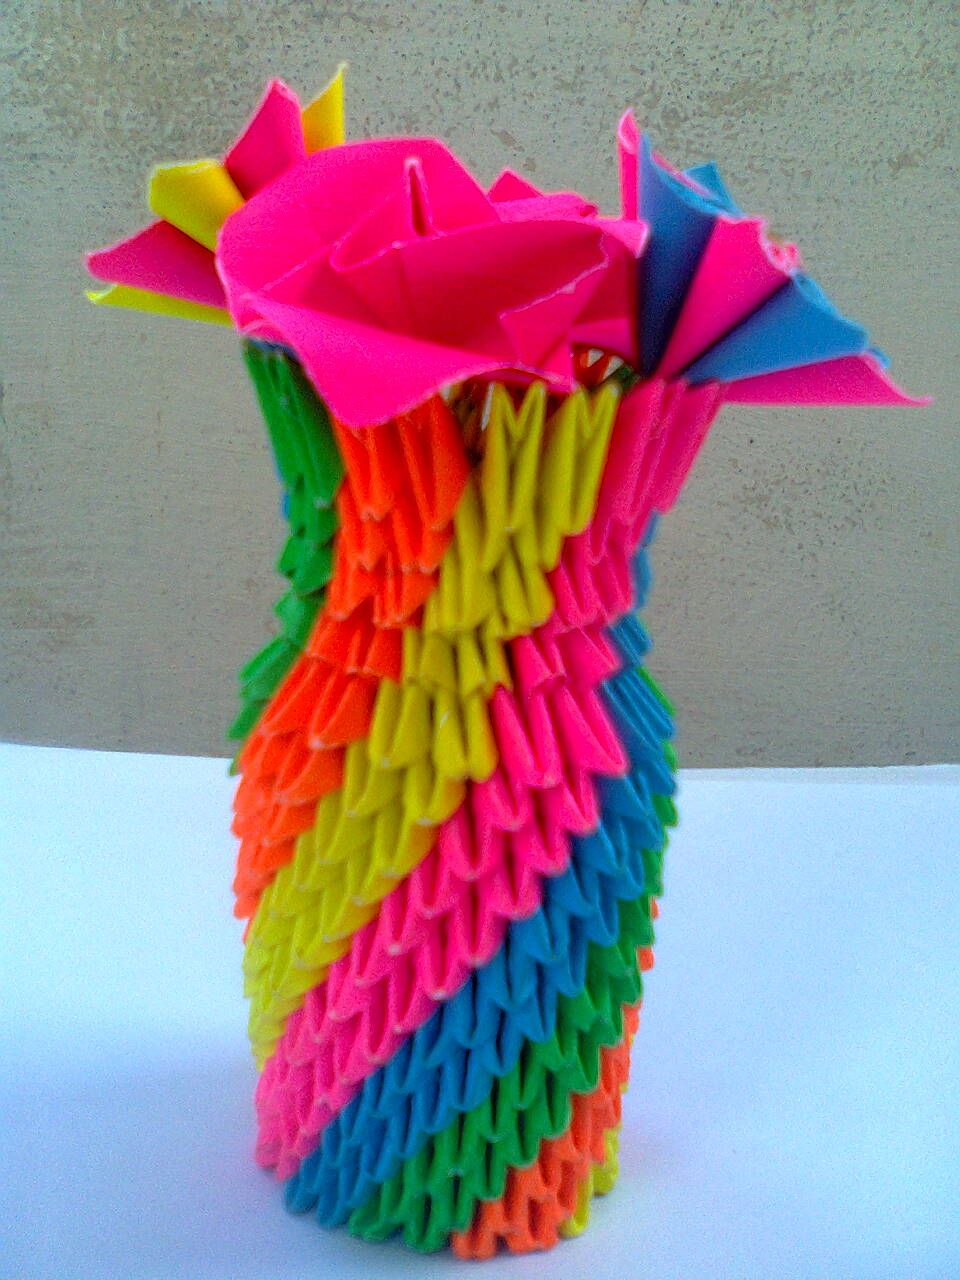 3d Origami Flower Vase 3d Origami Arts Pinterest 3d Origami